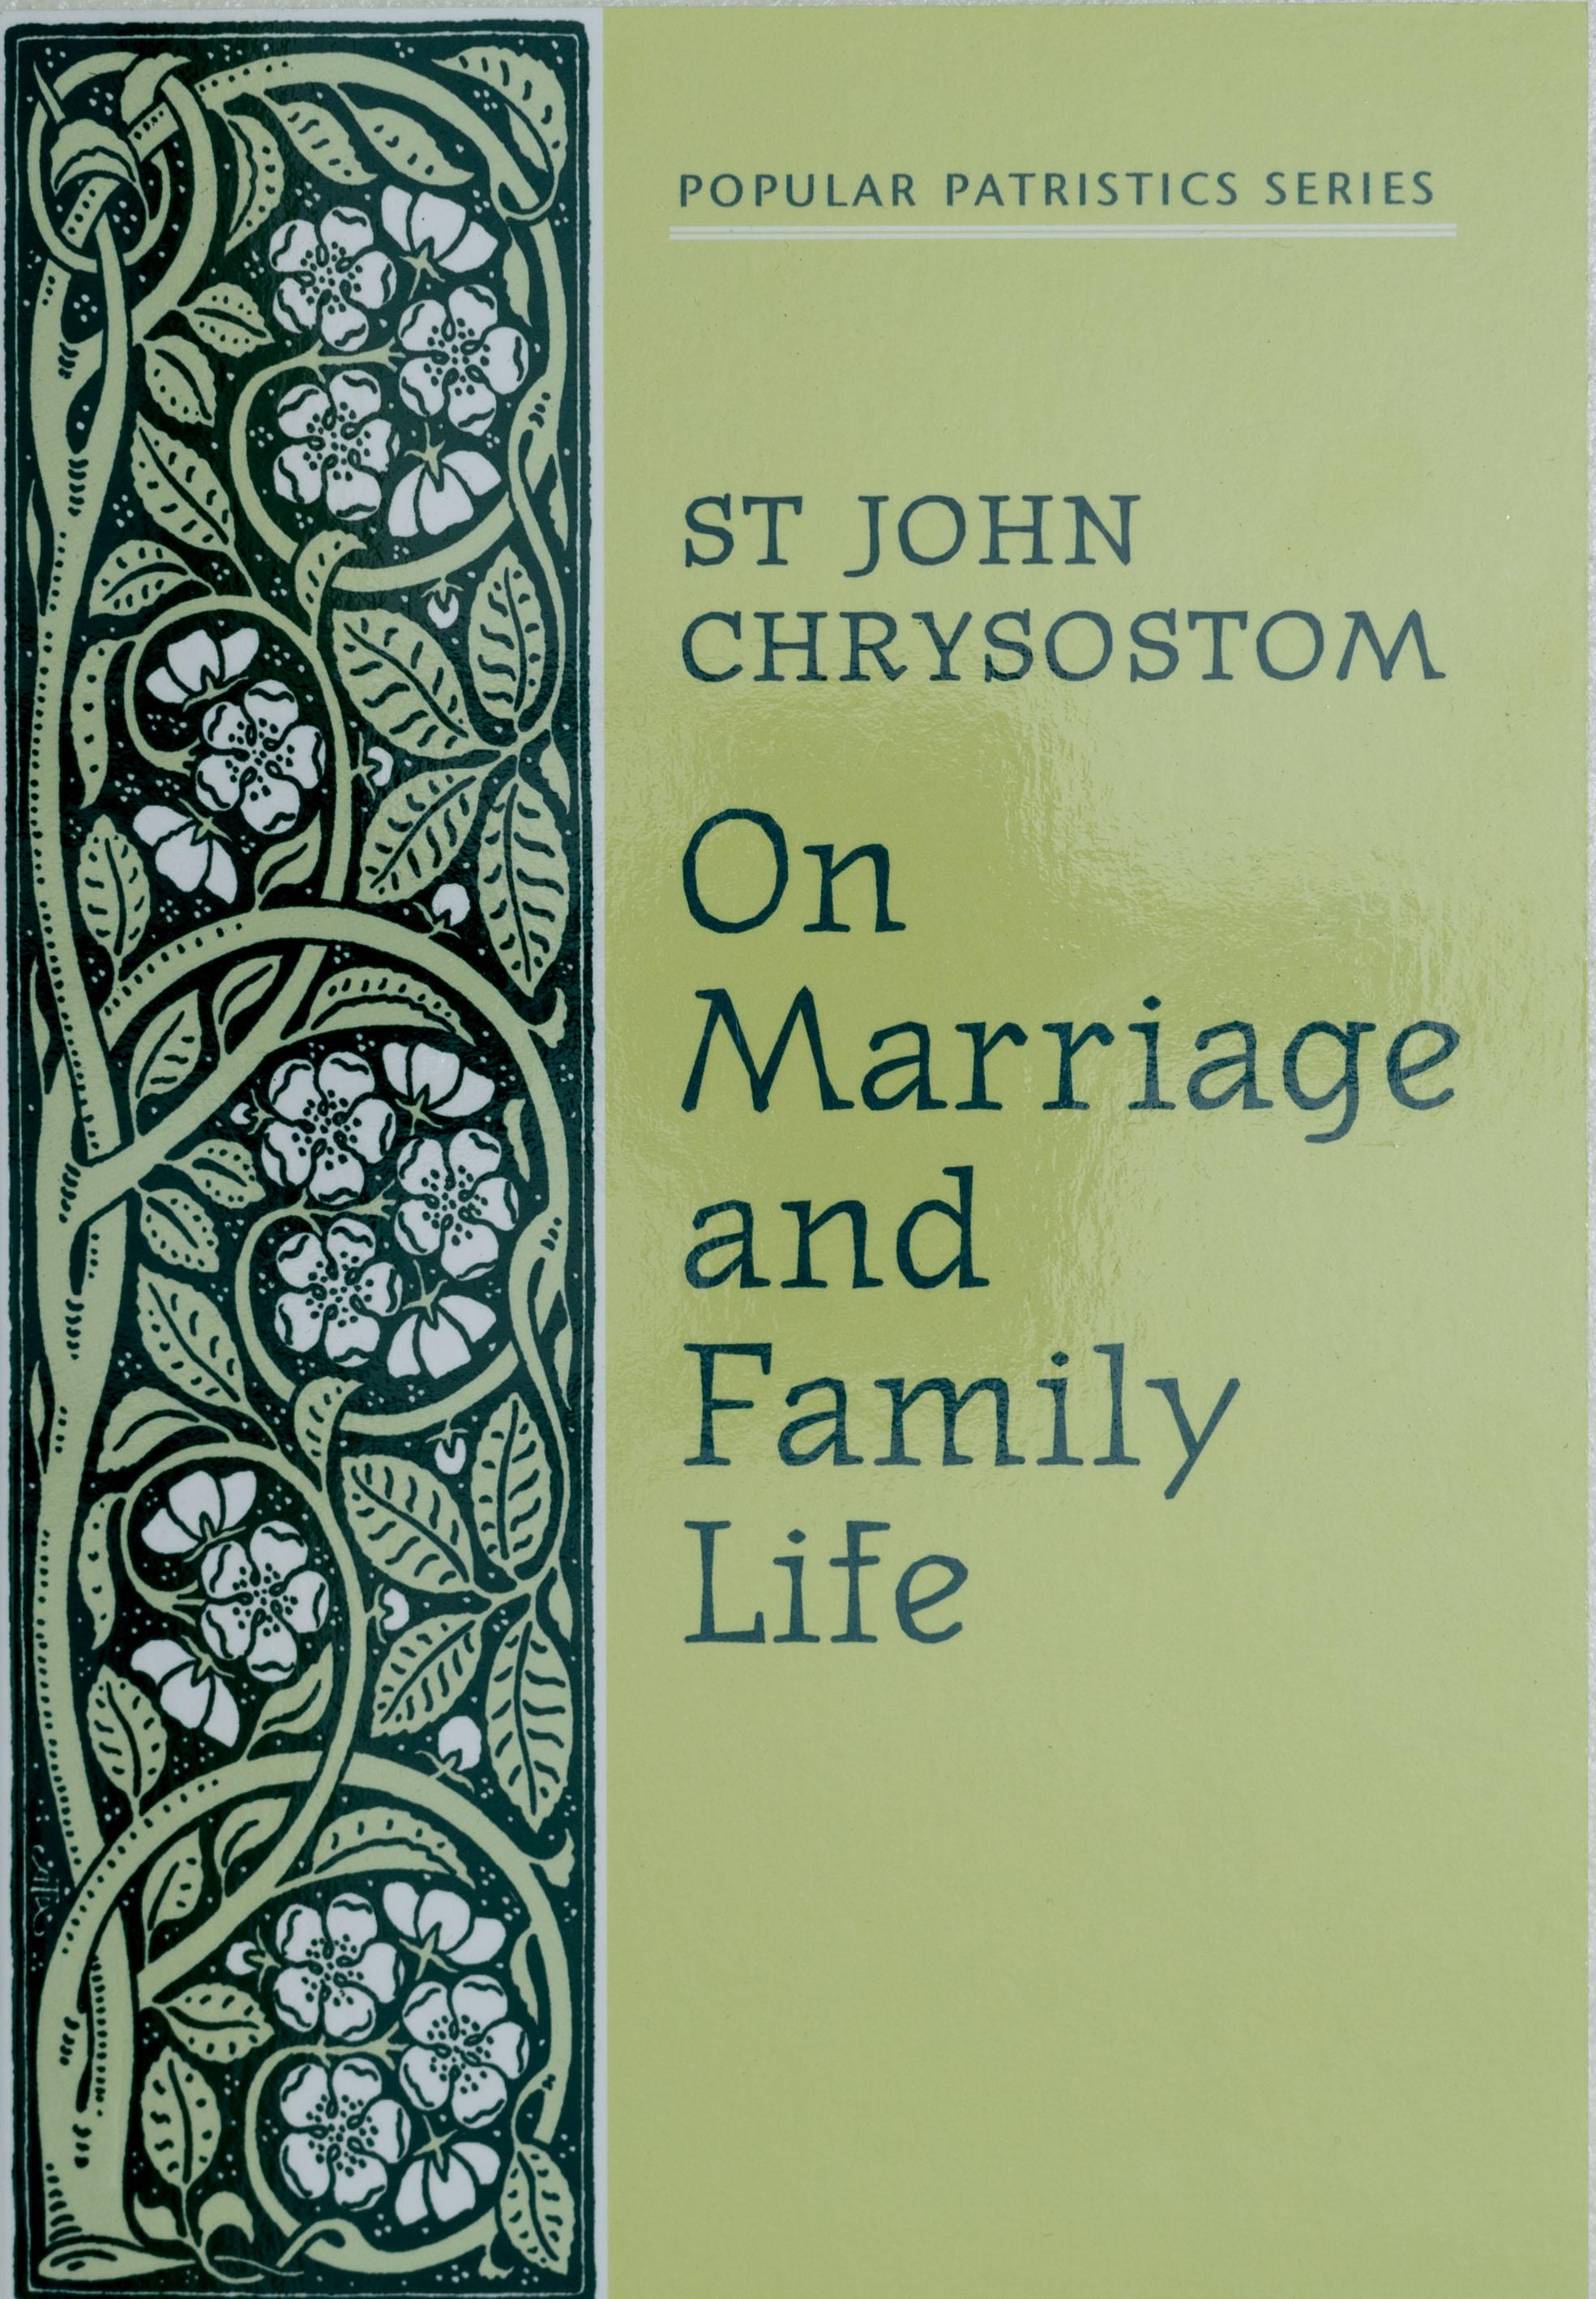 On Marriage and Family Life: St John Chrysostom